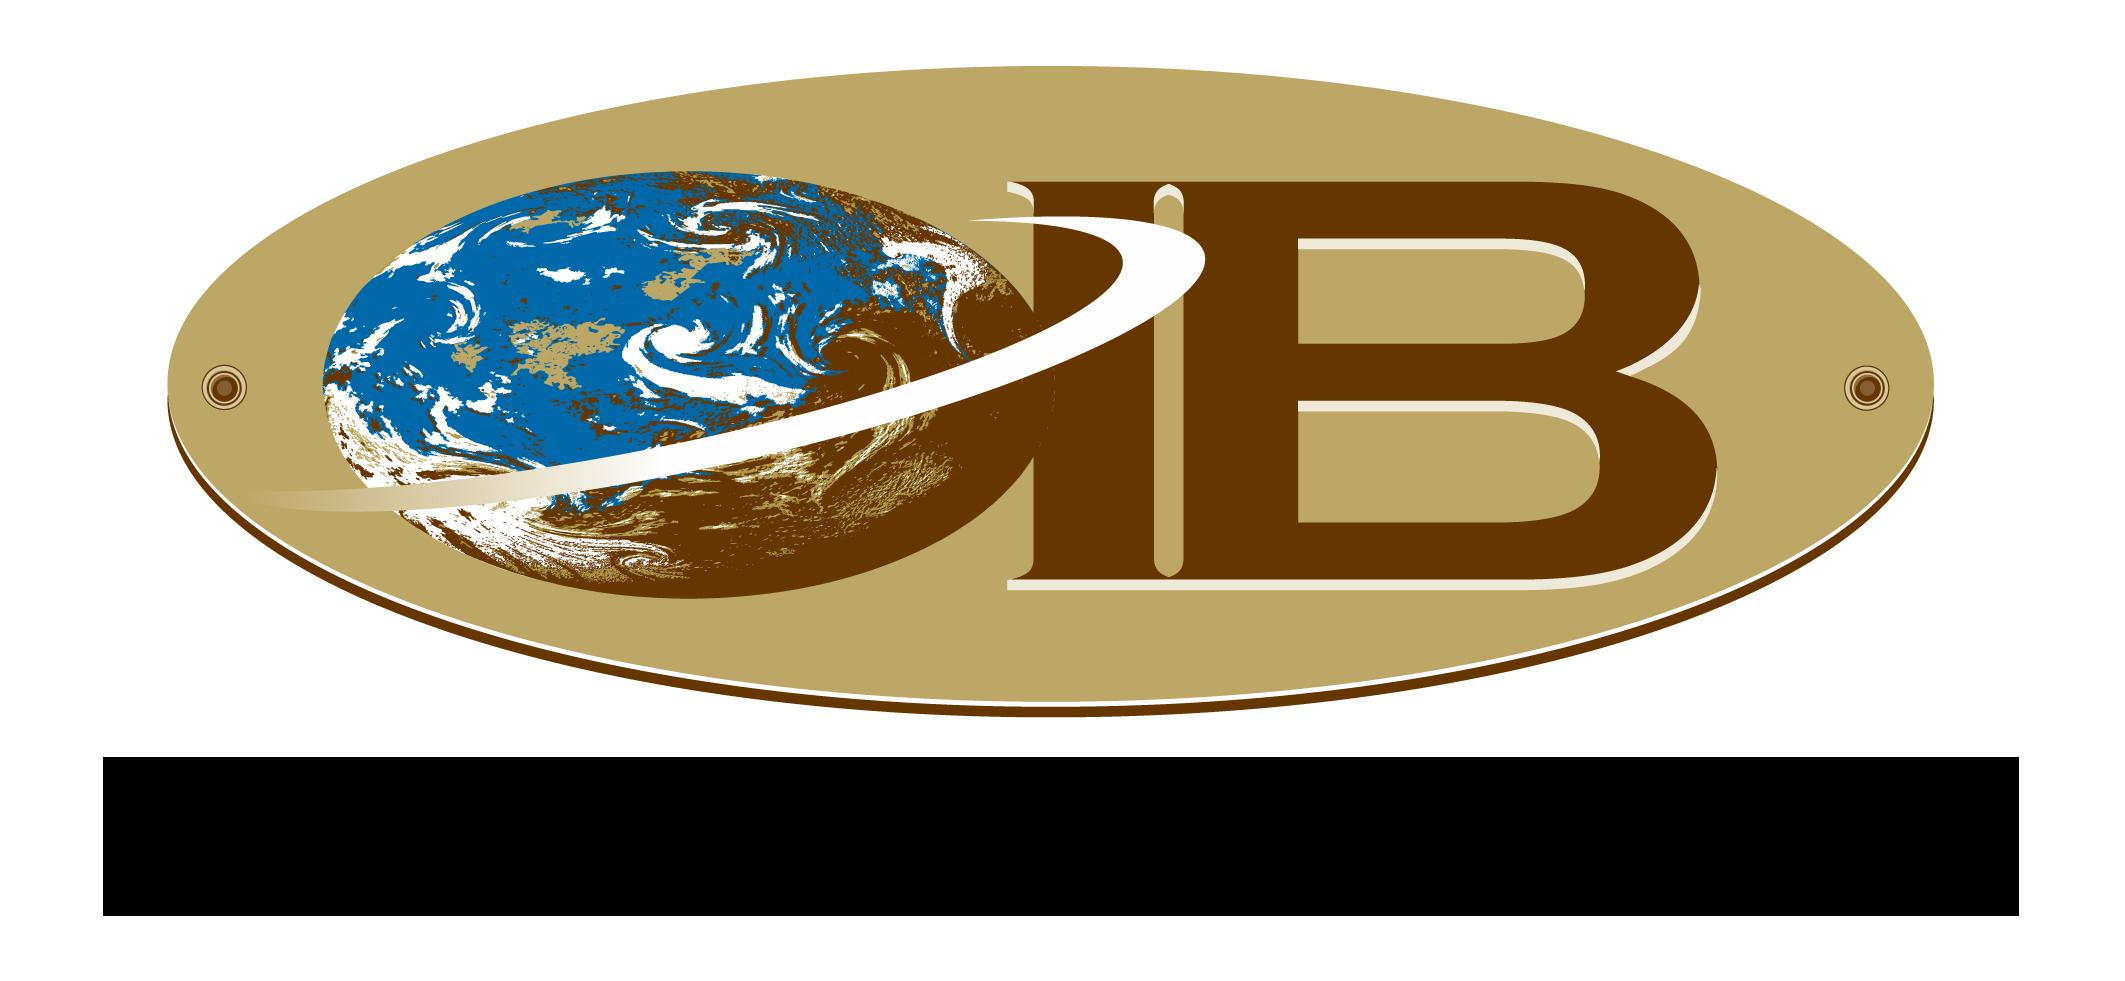 Oib consulting inc logo